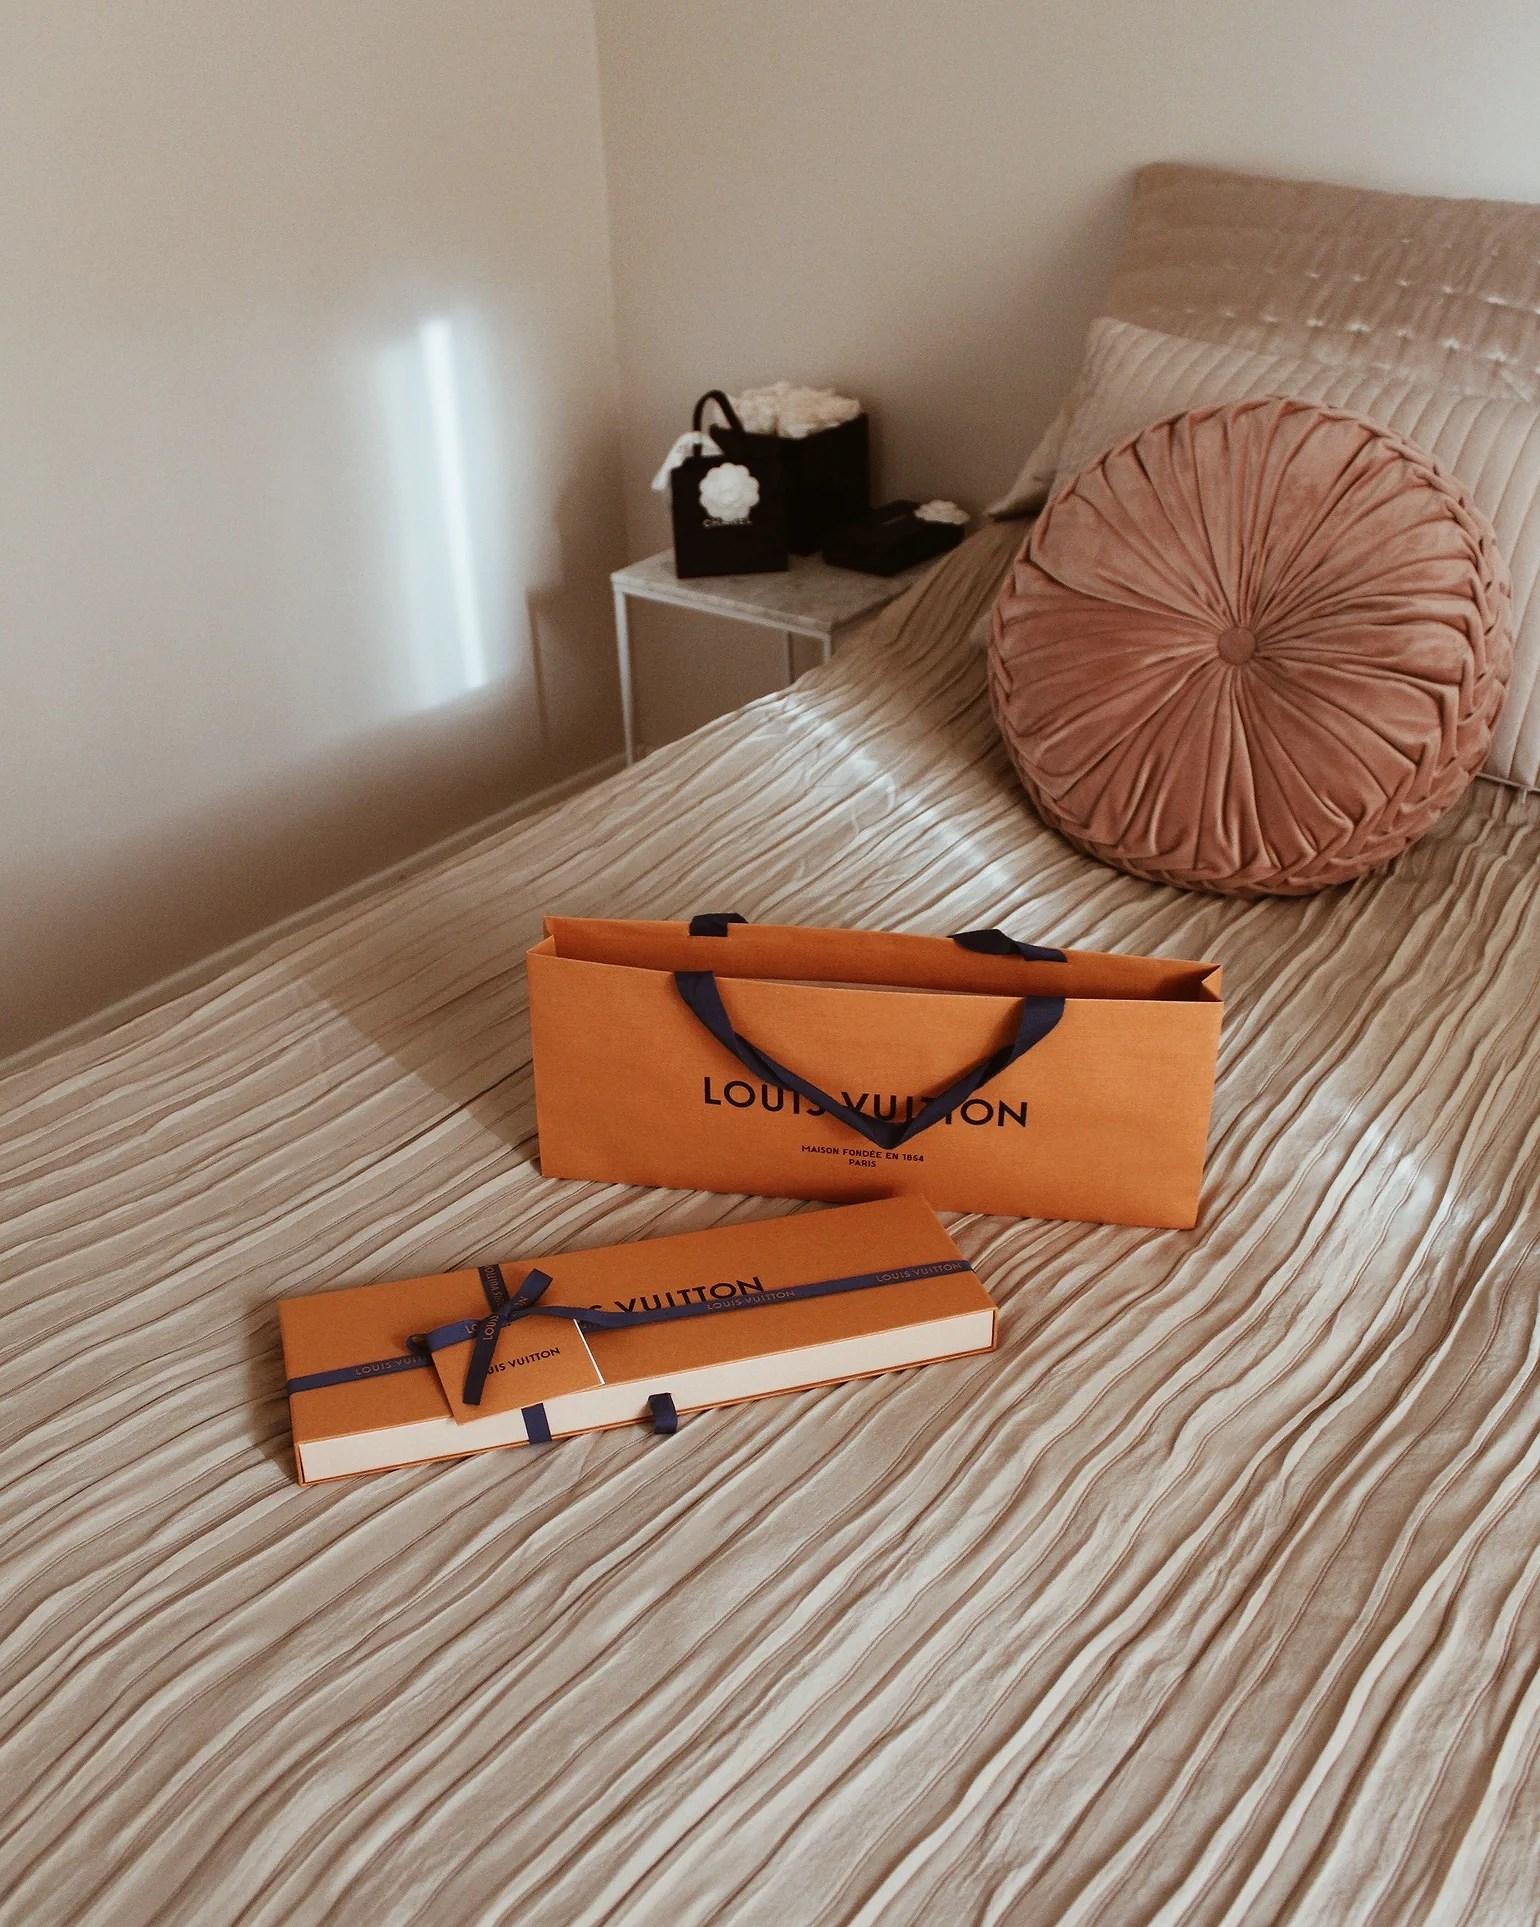 DRÖMKÖP från Louis Vuitton